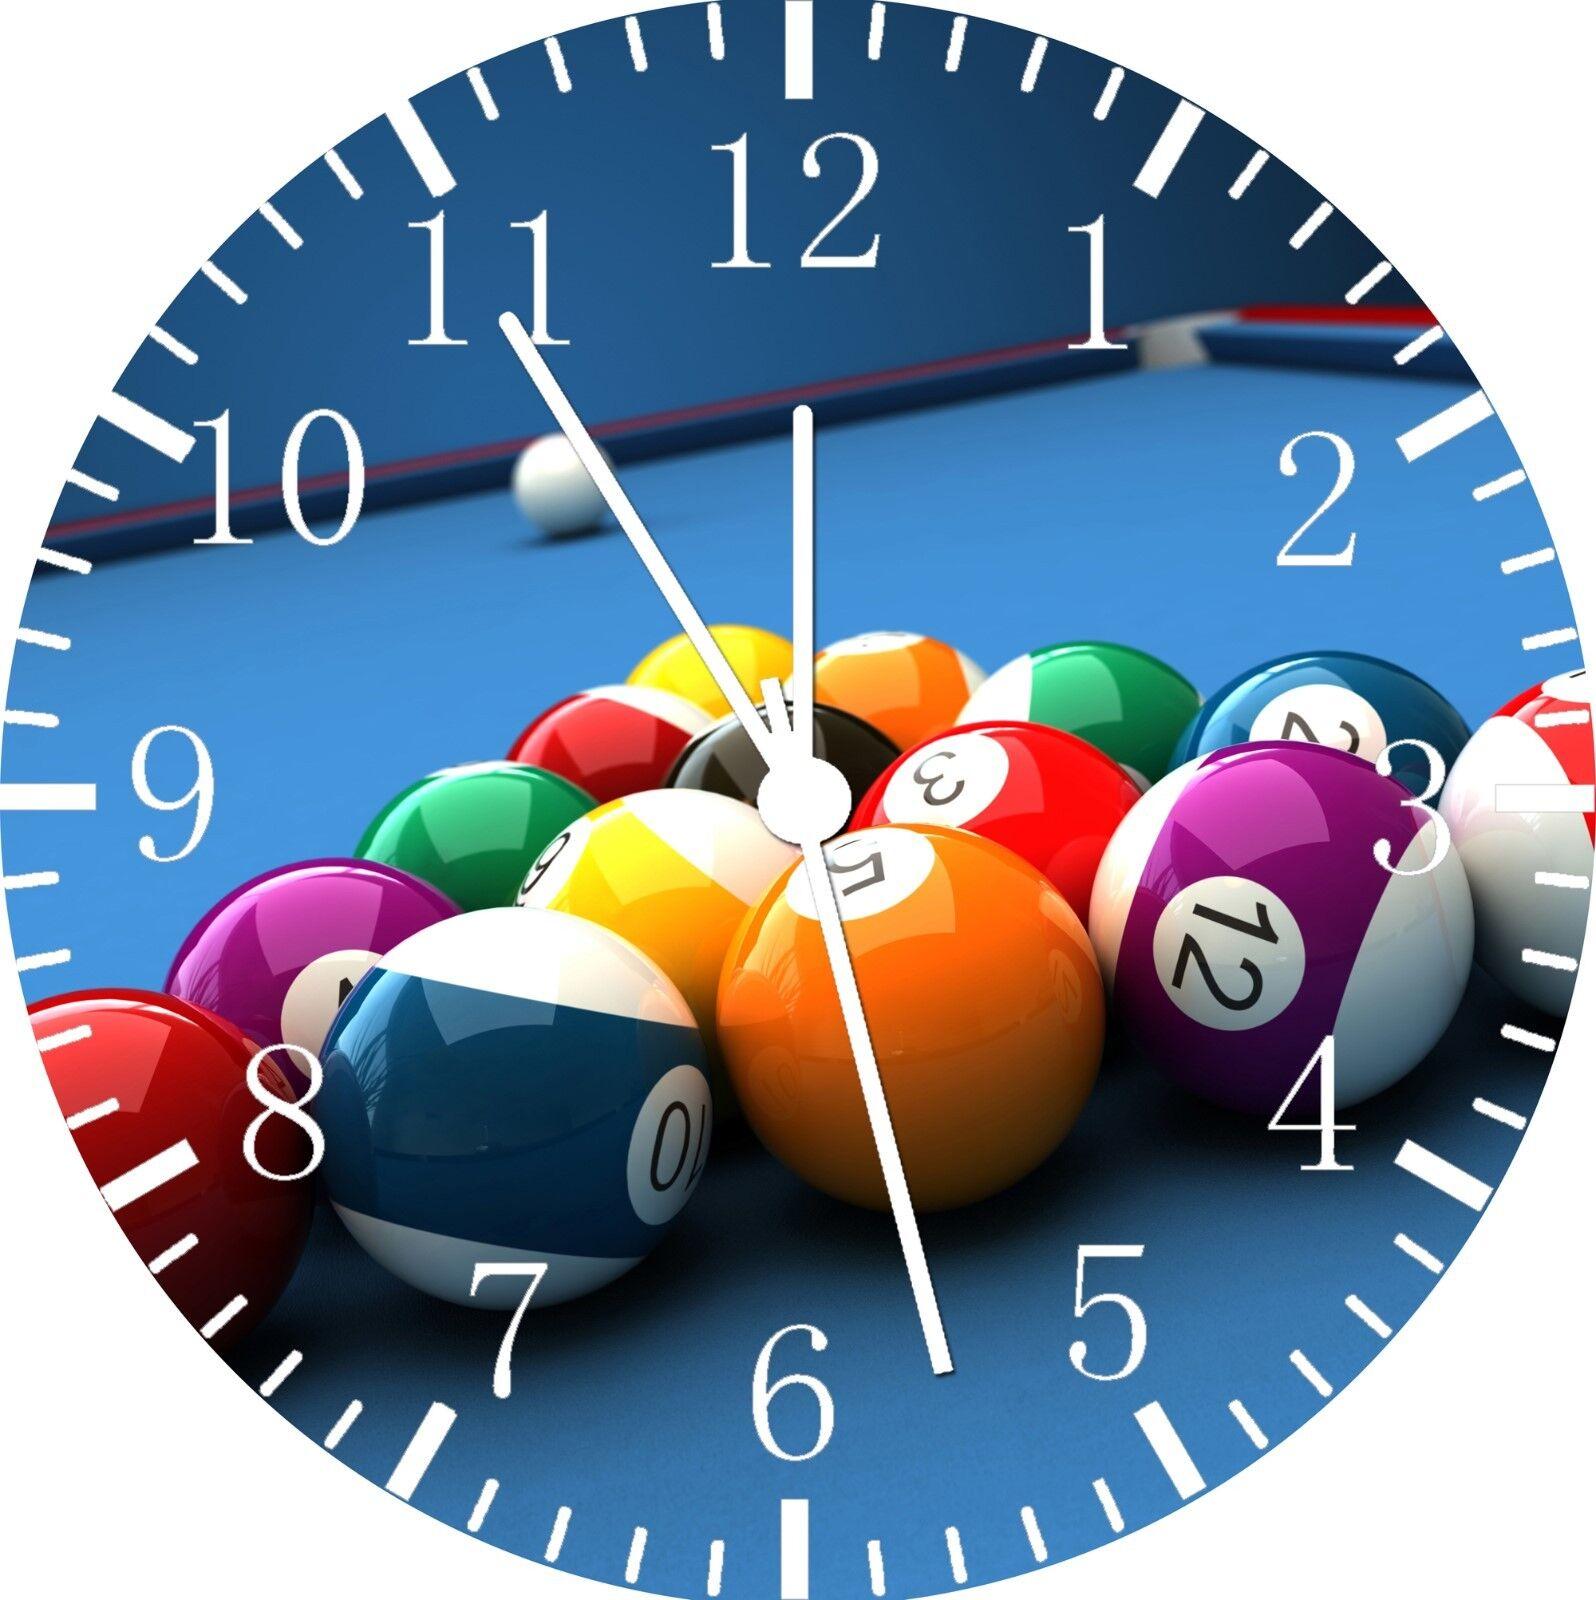 Billards Cue Pool Frameless Borderless Wall Clock Nice For Gifts or Decor E308